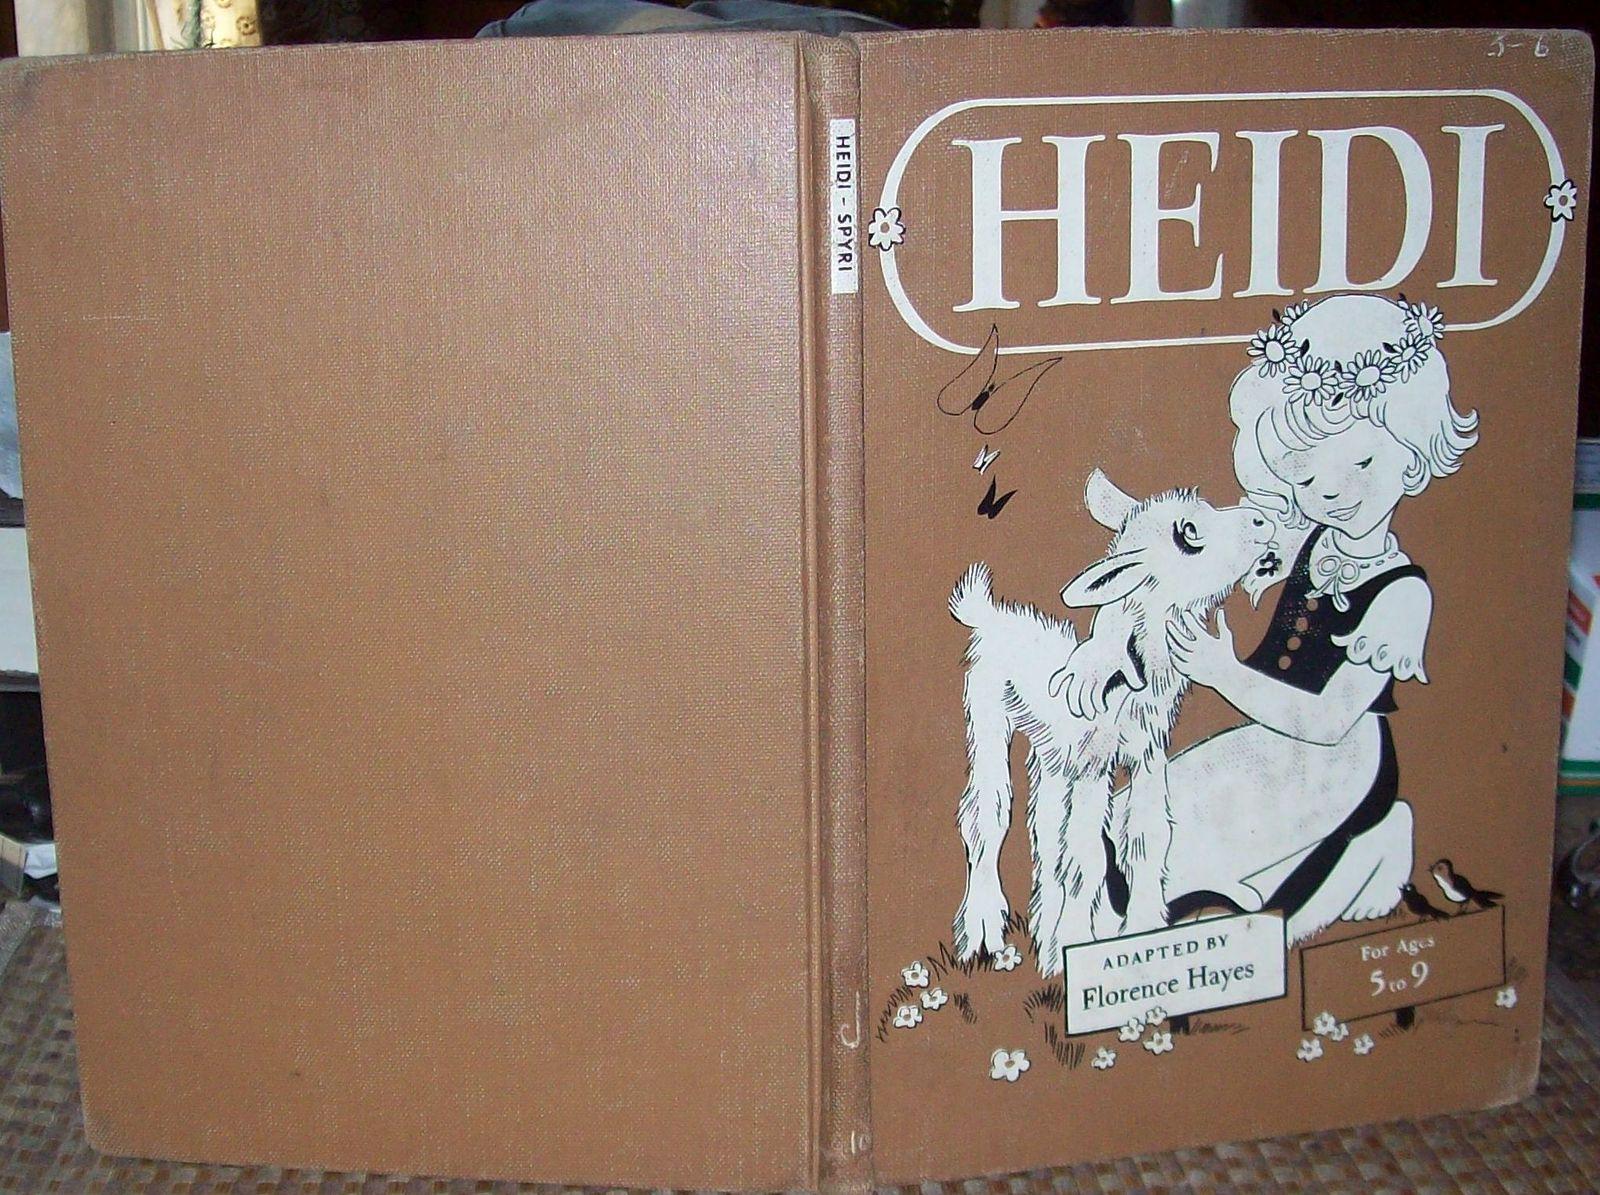 Heidi by Johanna Spyri 1946 HB Ages 5-9